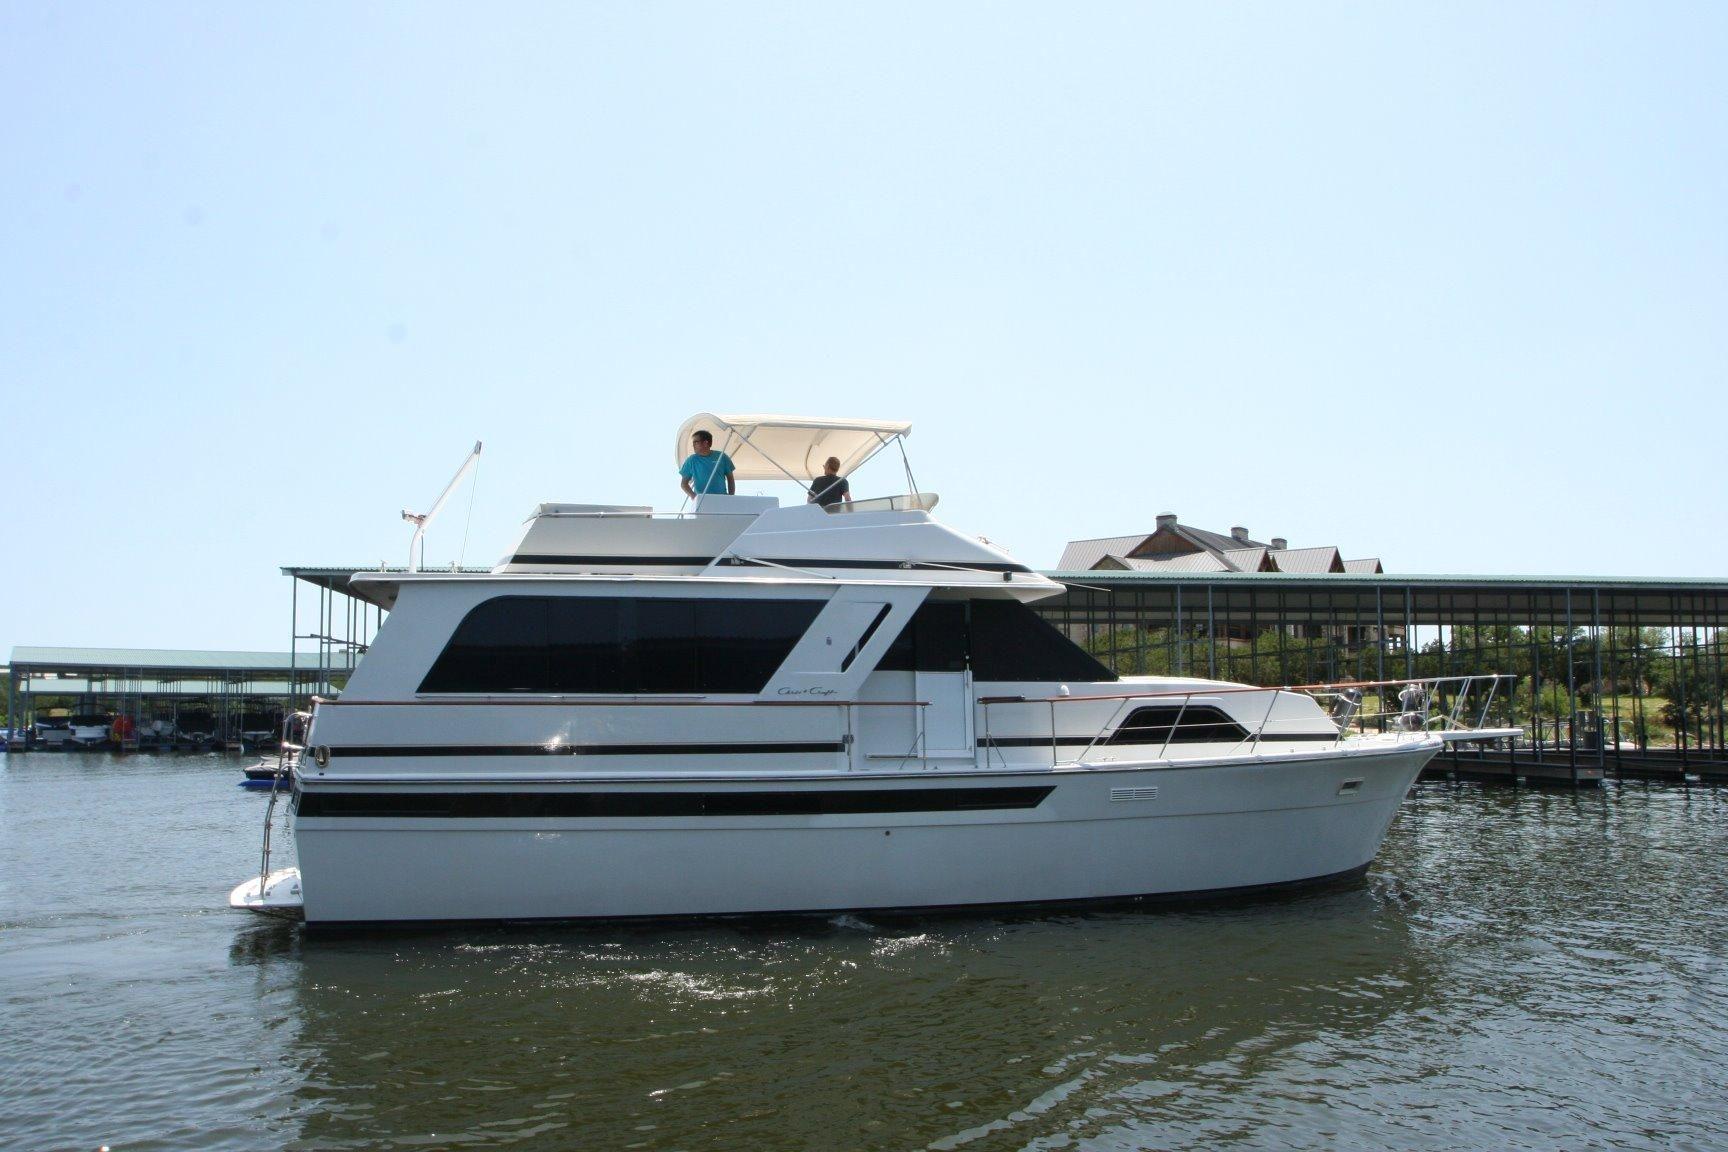 1988 chris craft 501 motor yacht power boat for sale www. Black Bedroom Furniture Sets. Home Design Ideas